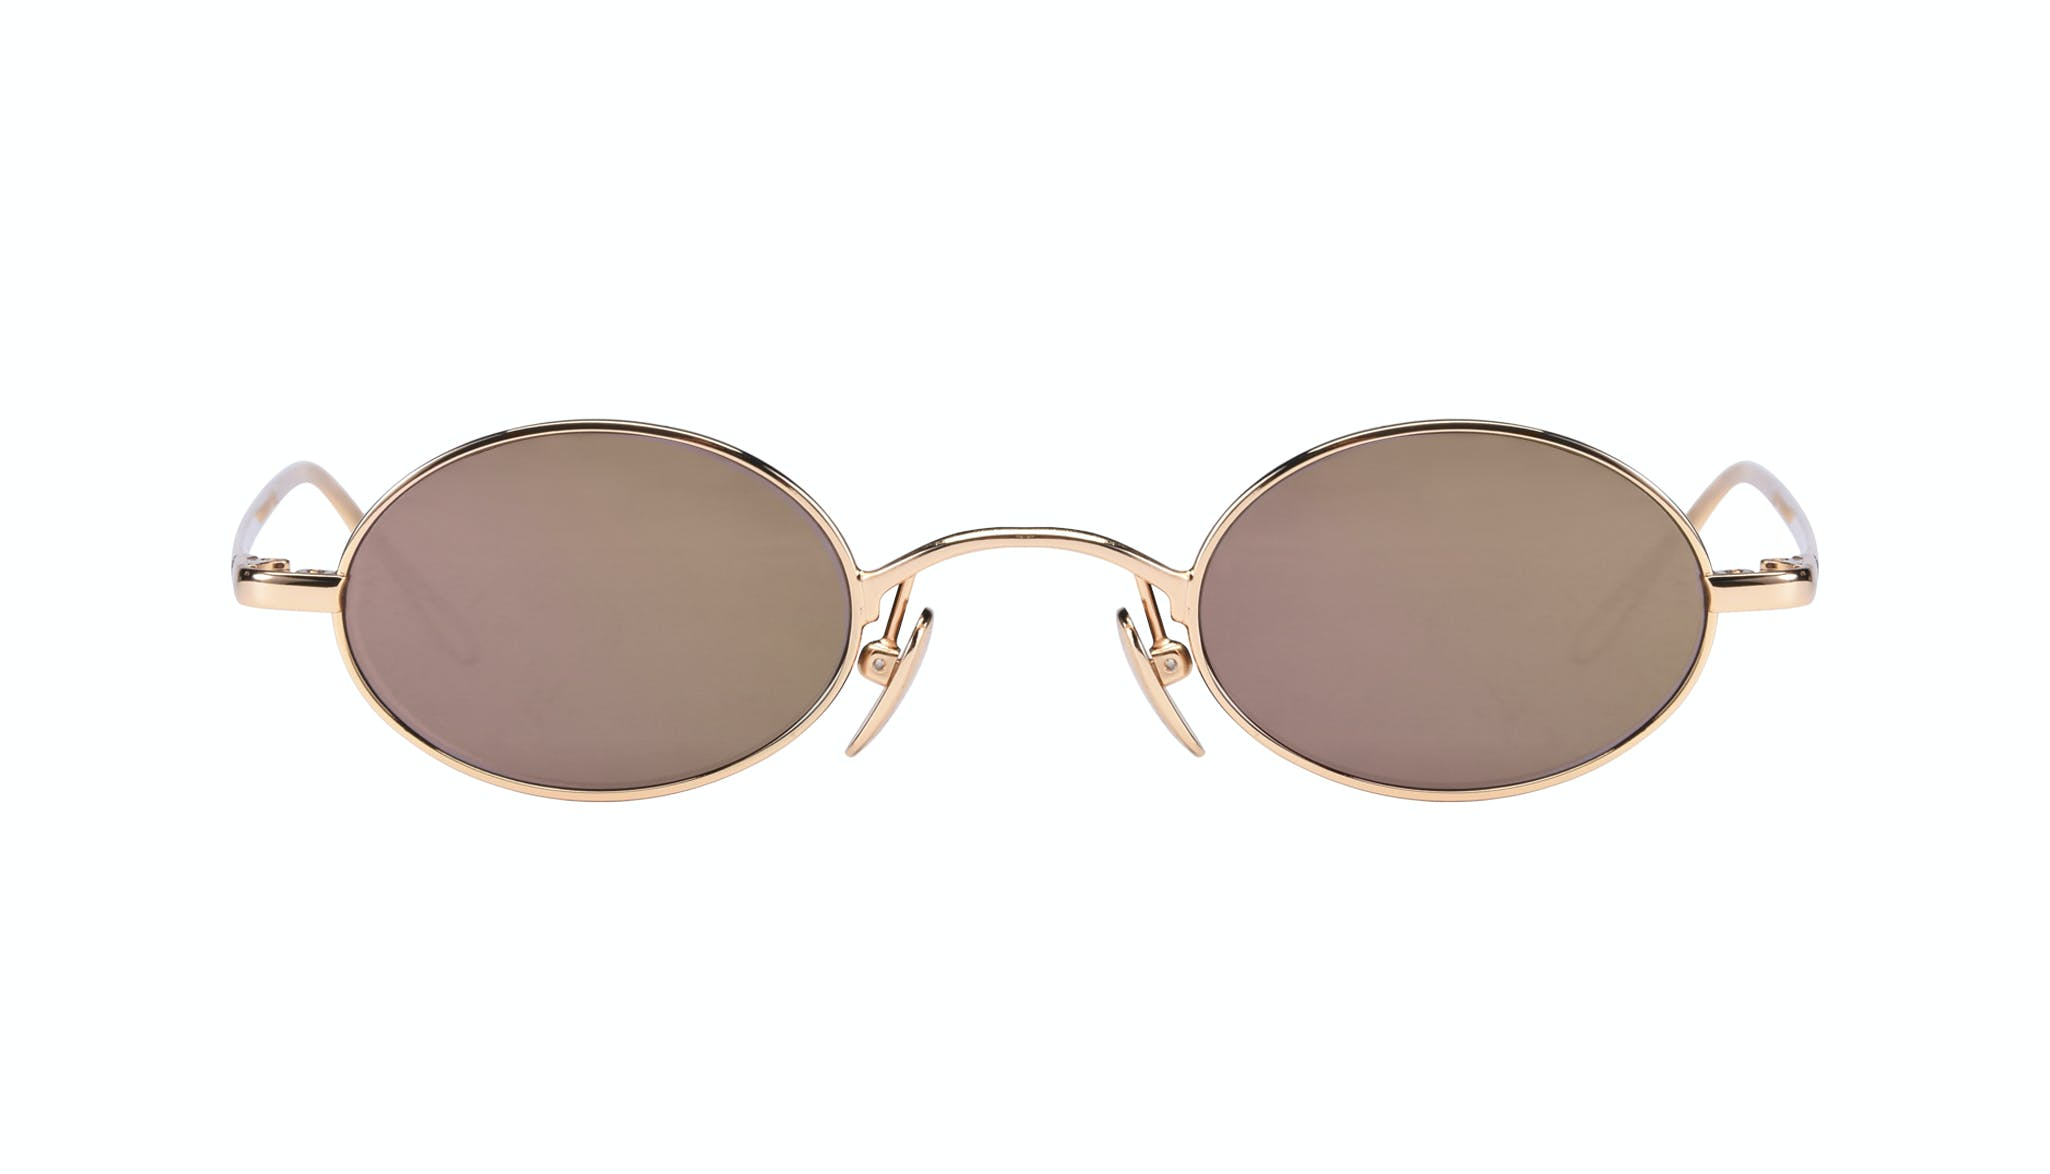 Affordable Fashion Glasses Round Sunglasses Women Stellar Gold